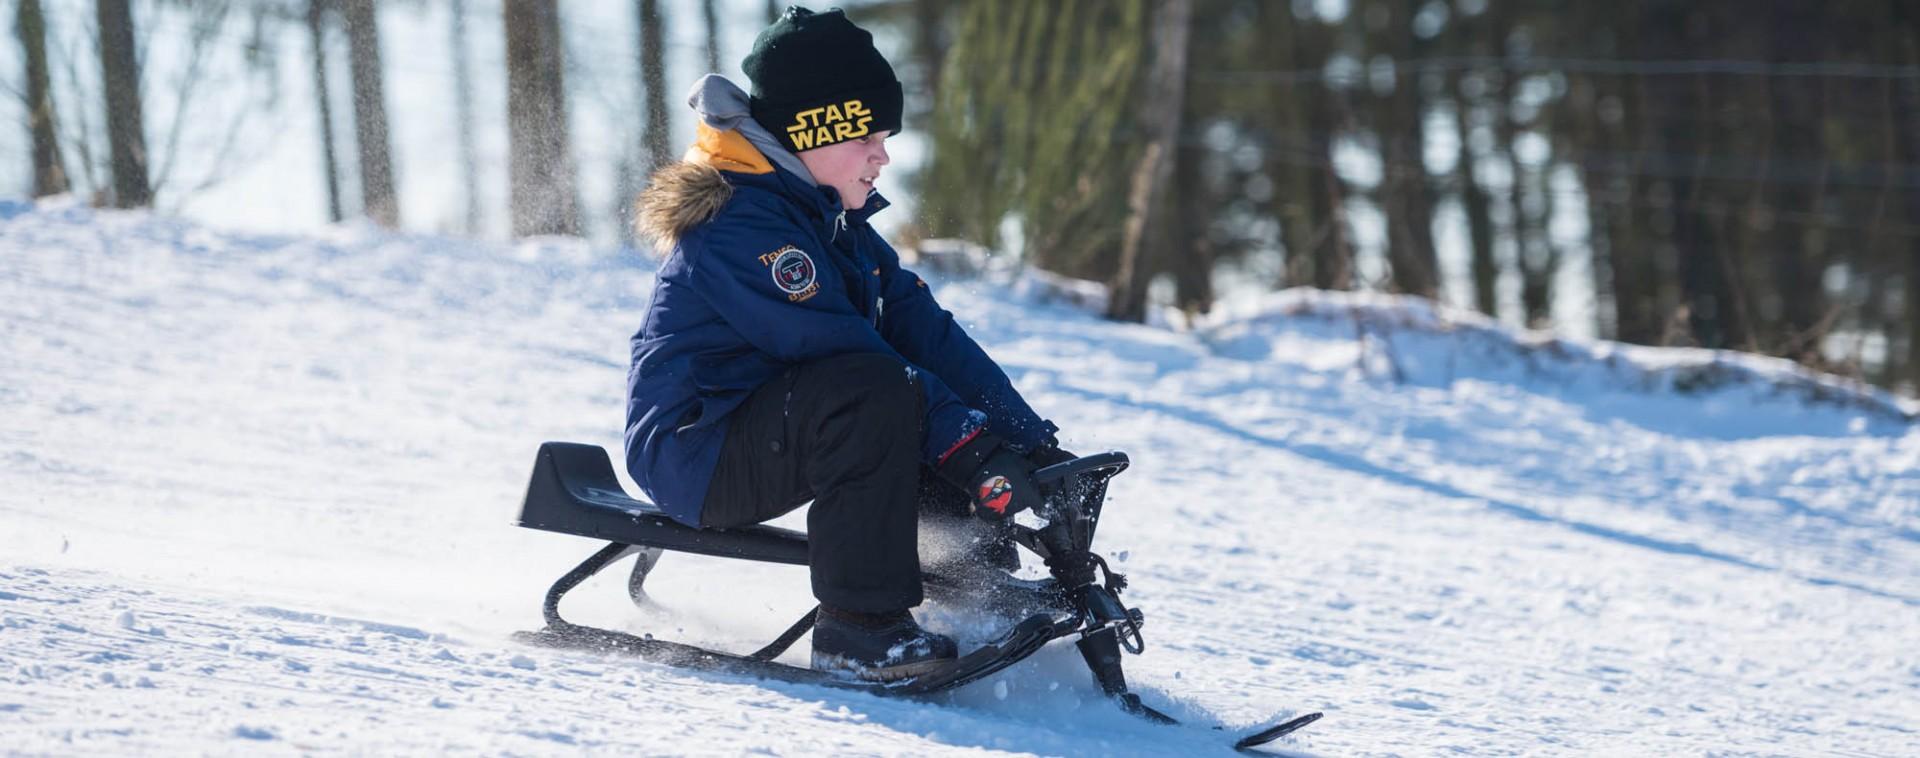 Lieux où jouer dans la neige avec les enfants en province de Liège | © Ostbelgien.eu - Dominik Ketz